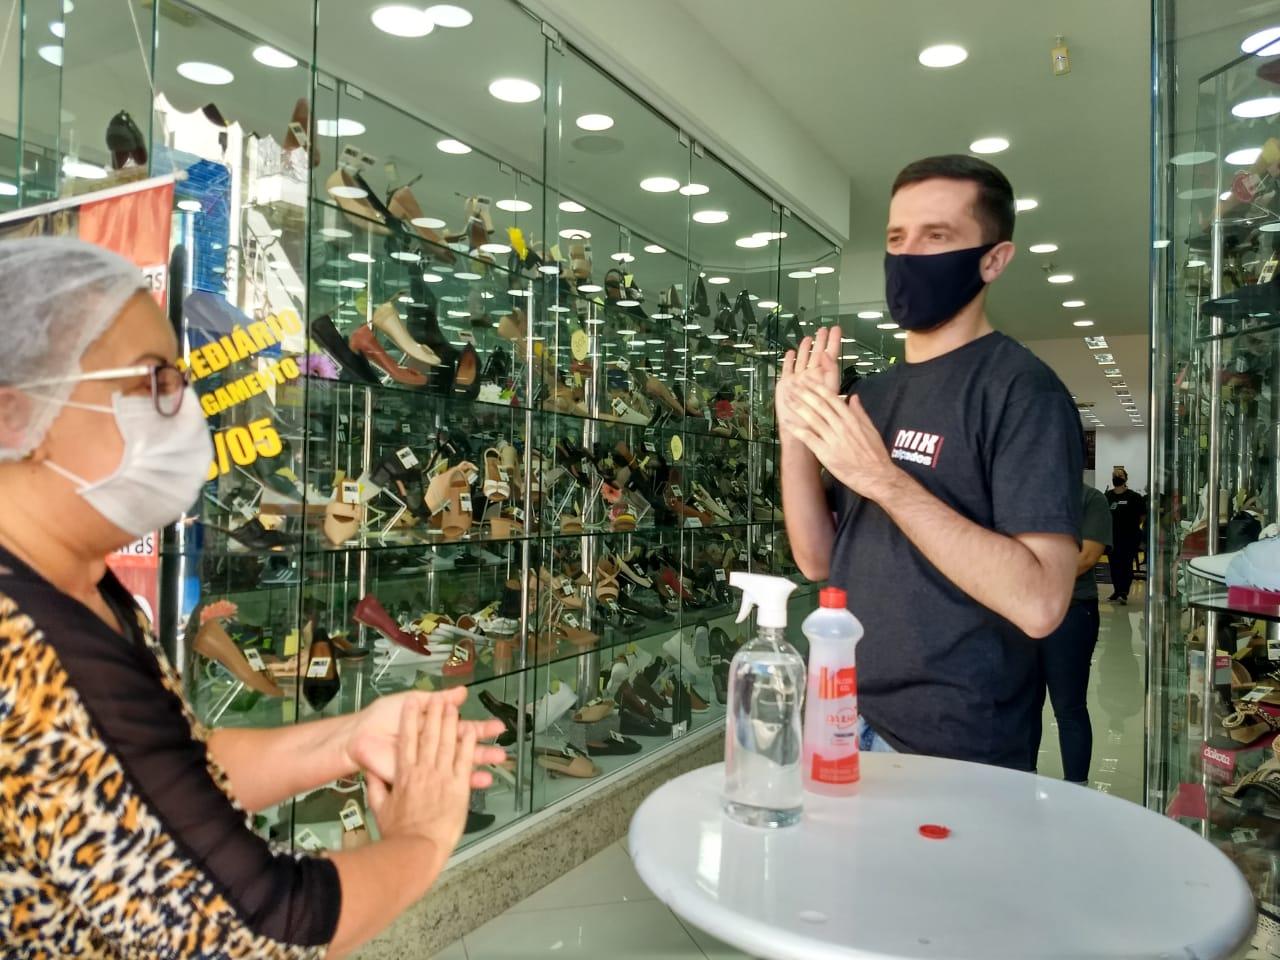 Vendedor instrui cliente na entrada da loja - Ian Sell/ND